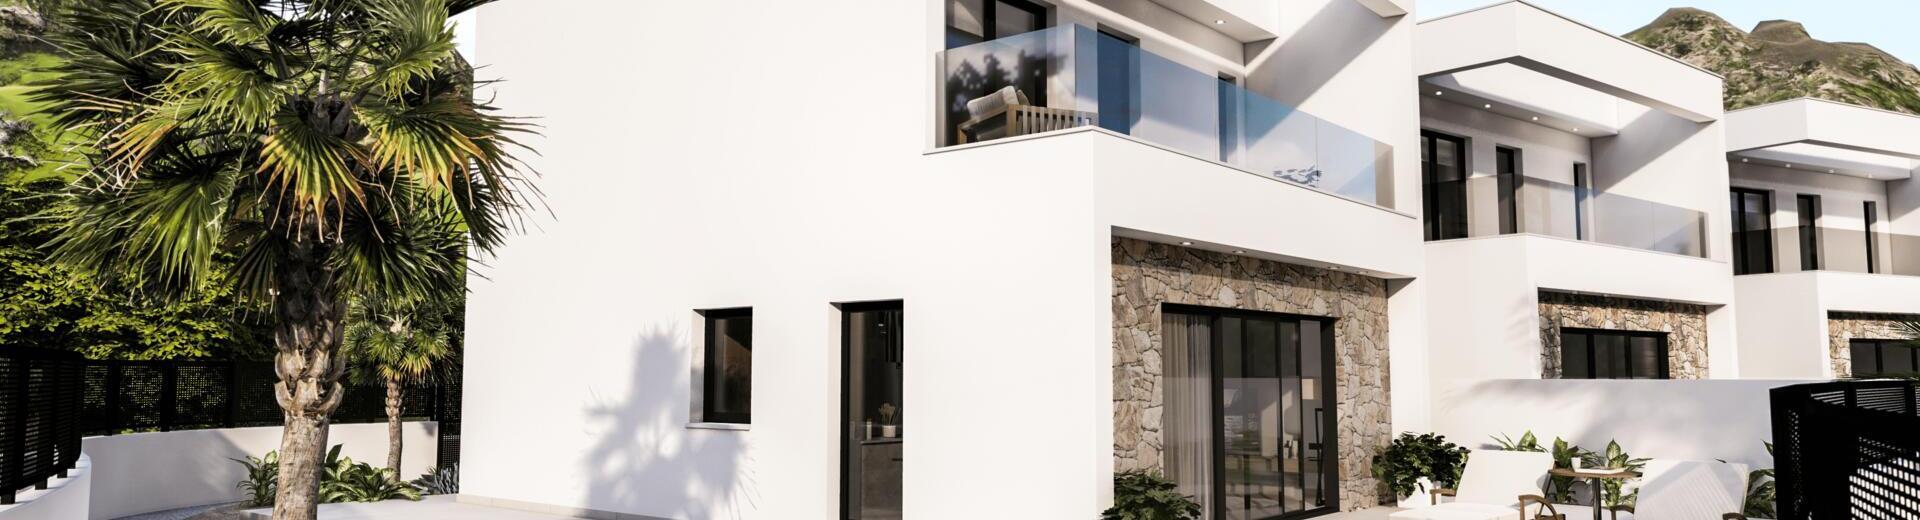 VIP7688: Villa à vendre